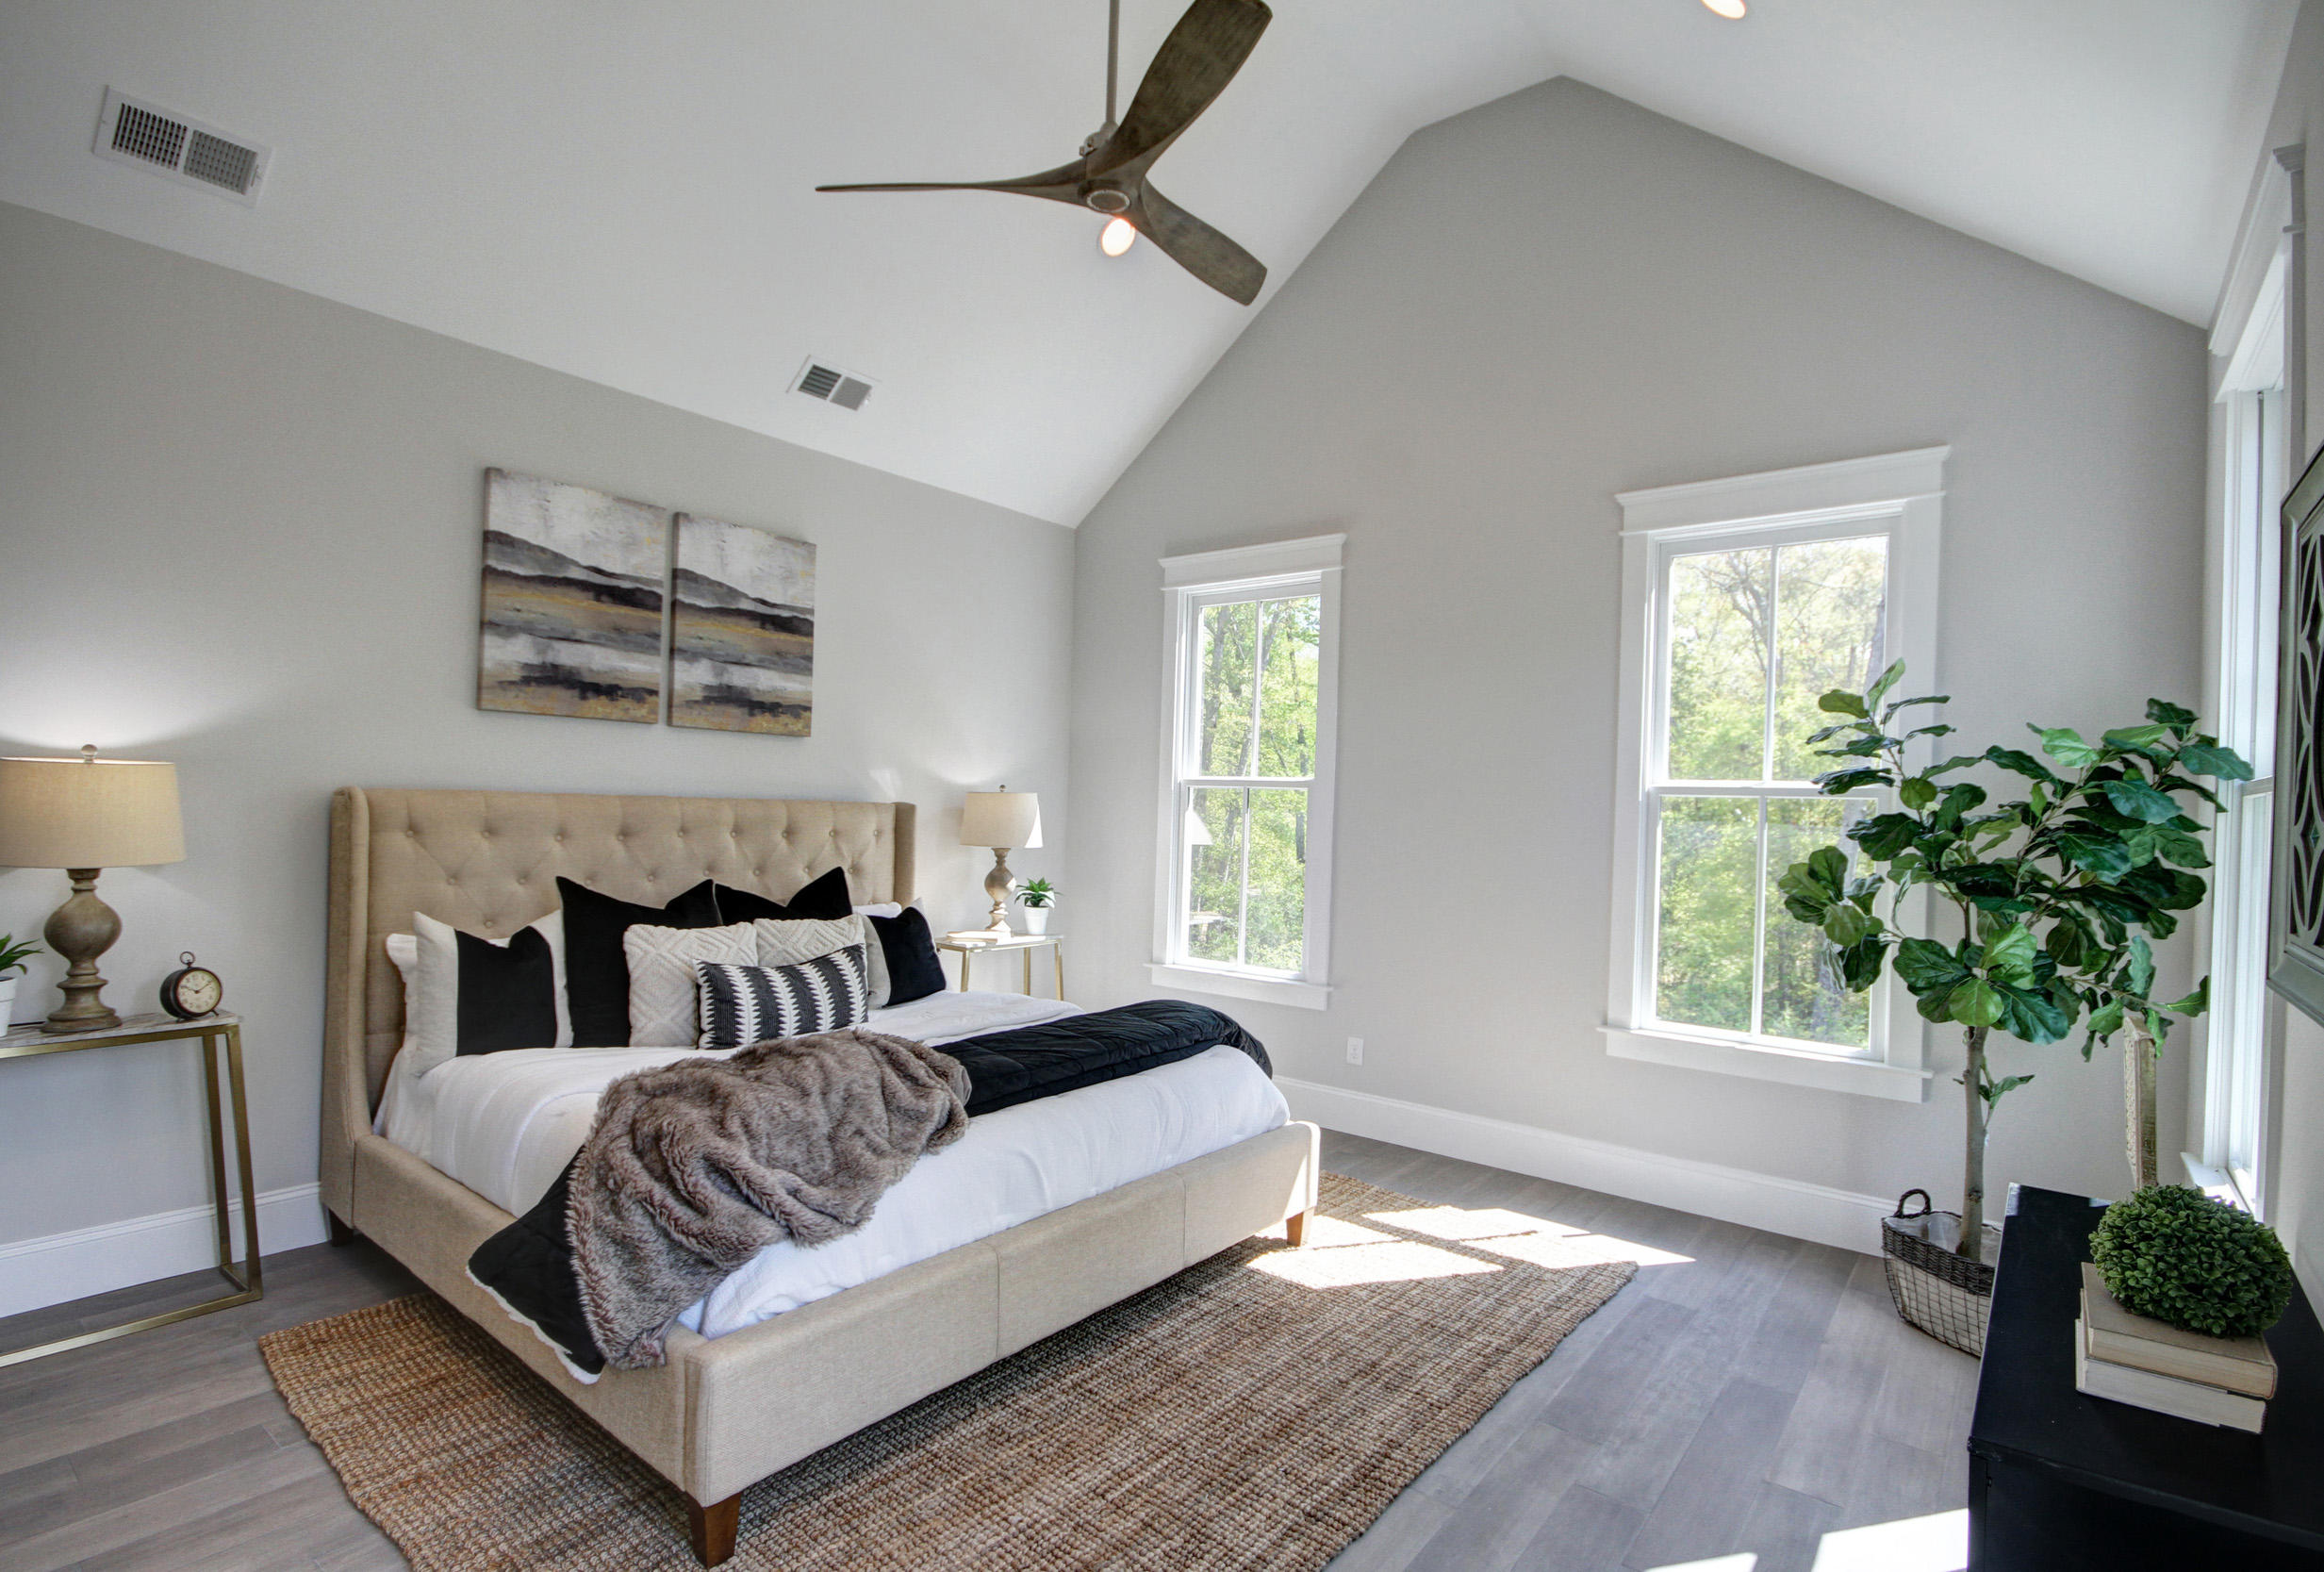 Mathis Ferry Court Homes For Sale - 1212 Clonmel, Mount Pleasant, SC - 36